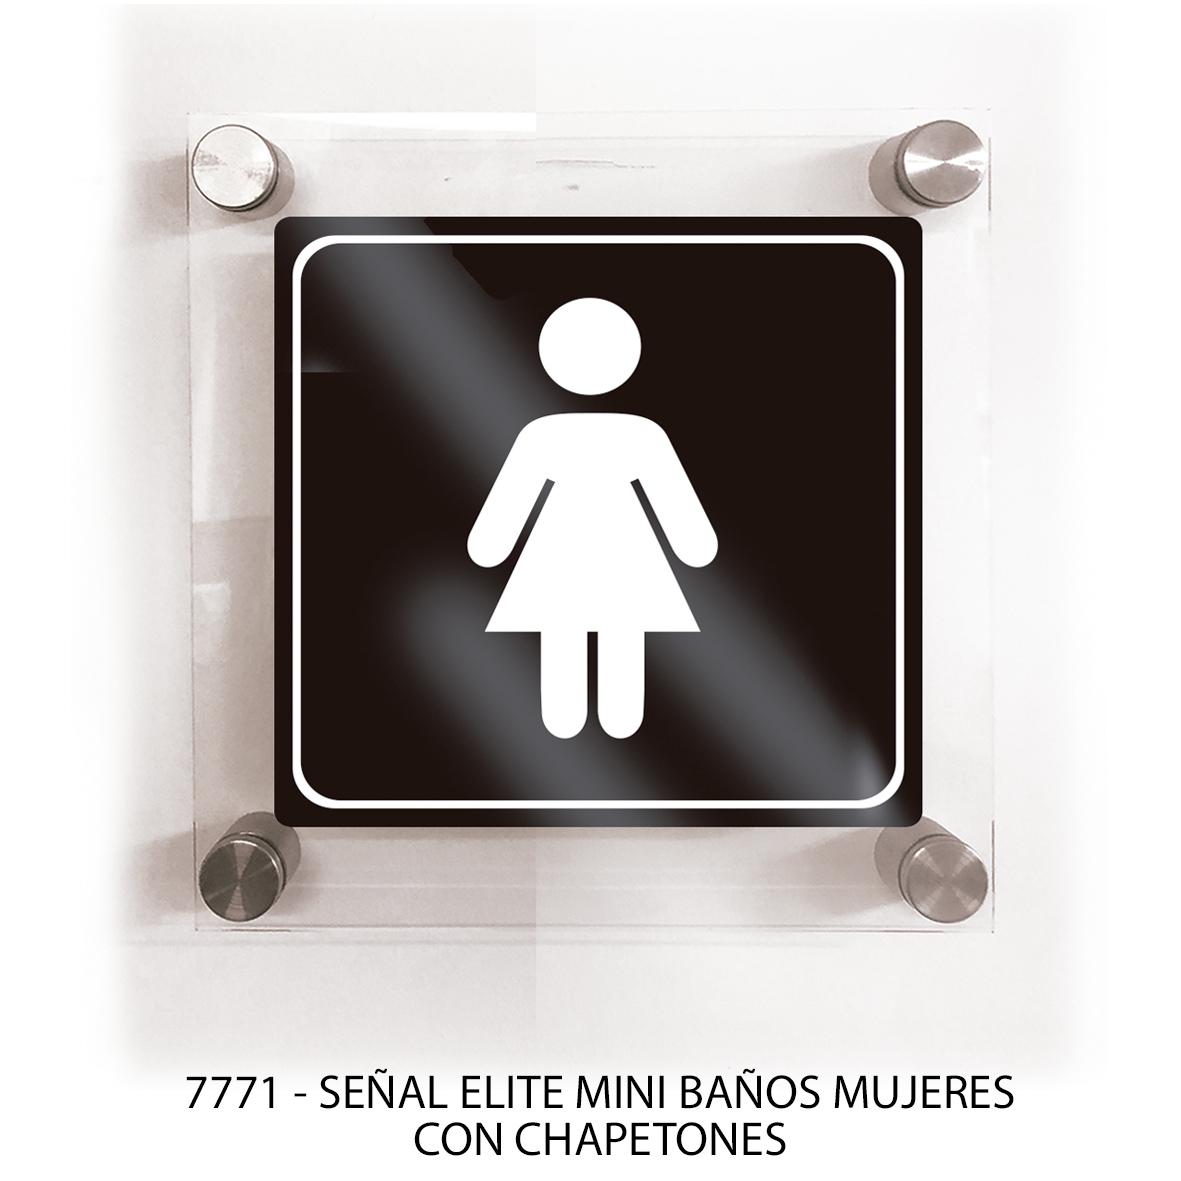 Señal para baños mujeres con chapetones línea elite mini modelo 7771 Sablón